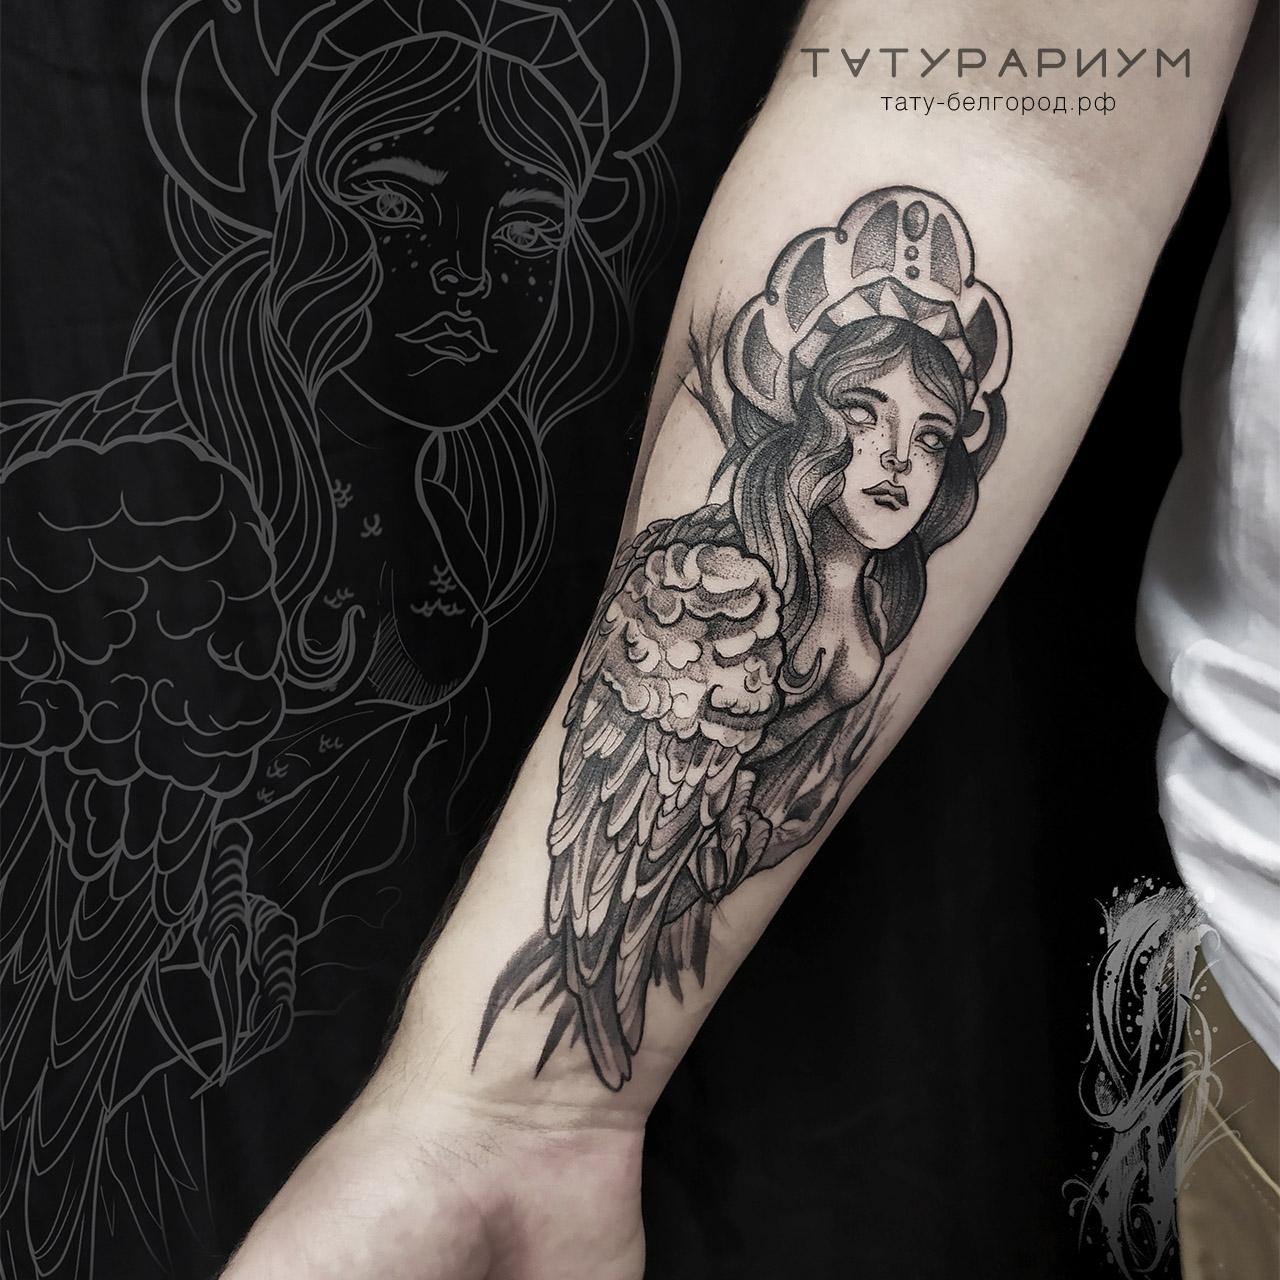 Фото татуировки, птица гамаюн, татуировк